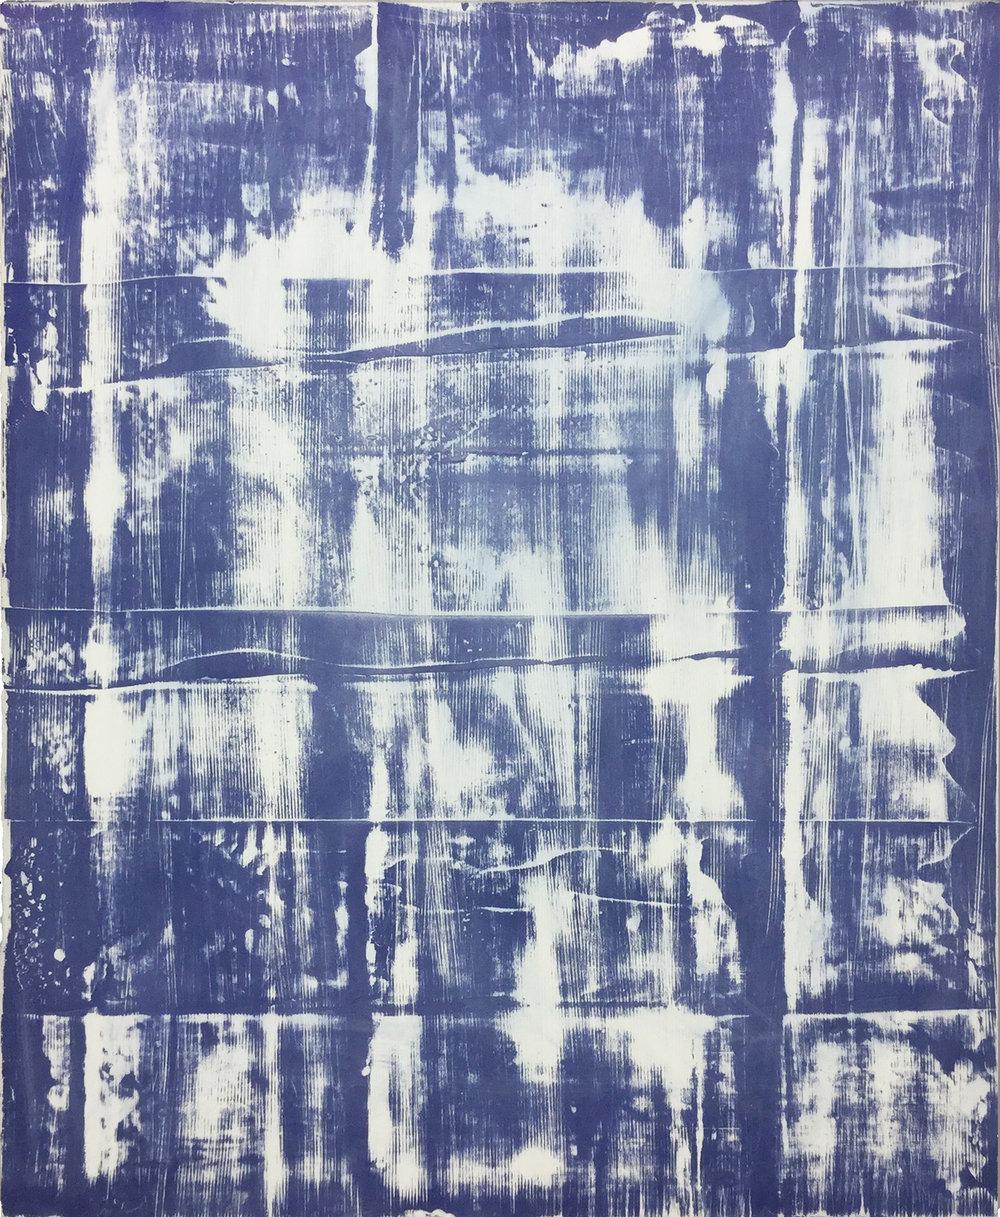 "Pierre Julien,  Offcut 02,  2017, plaster and spray paint on gypsum, 30"" x 24"" (76x 61 cm)"